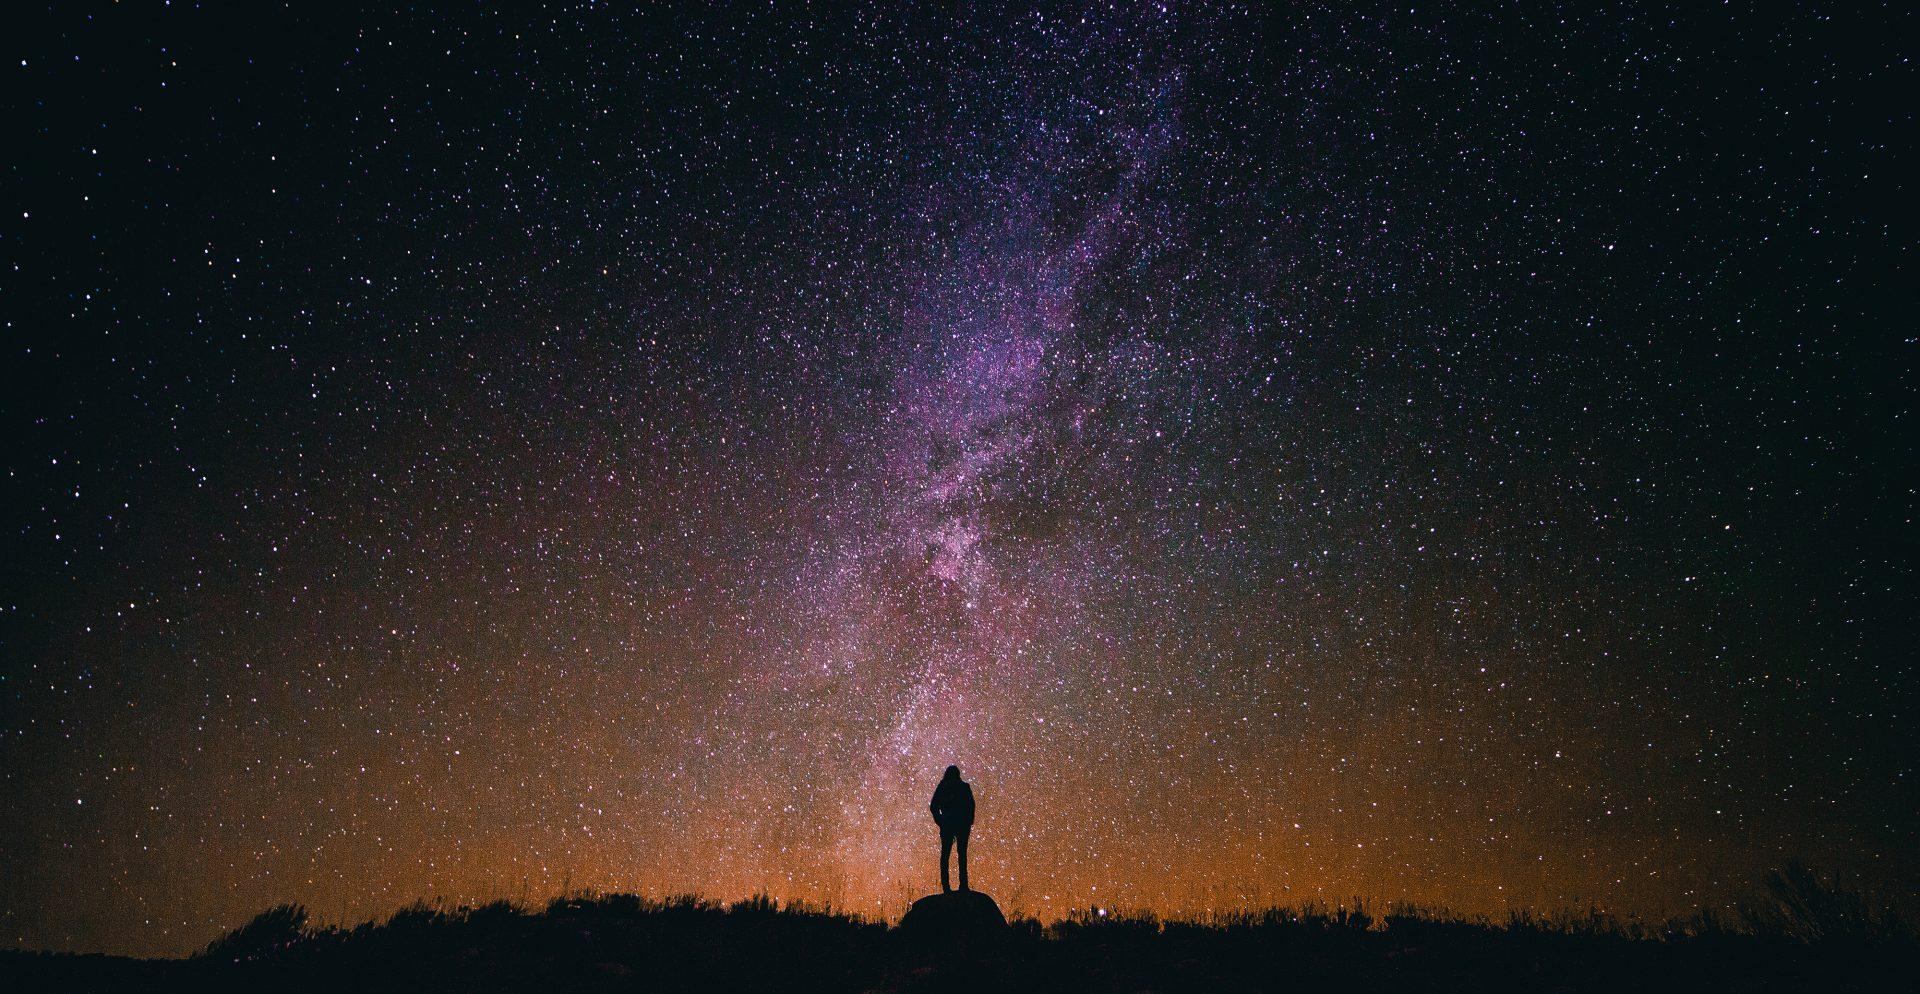 The importance of feeling wonder